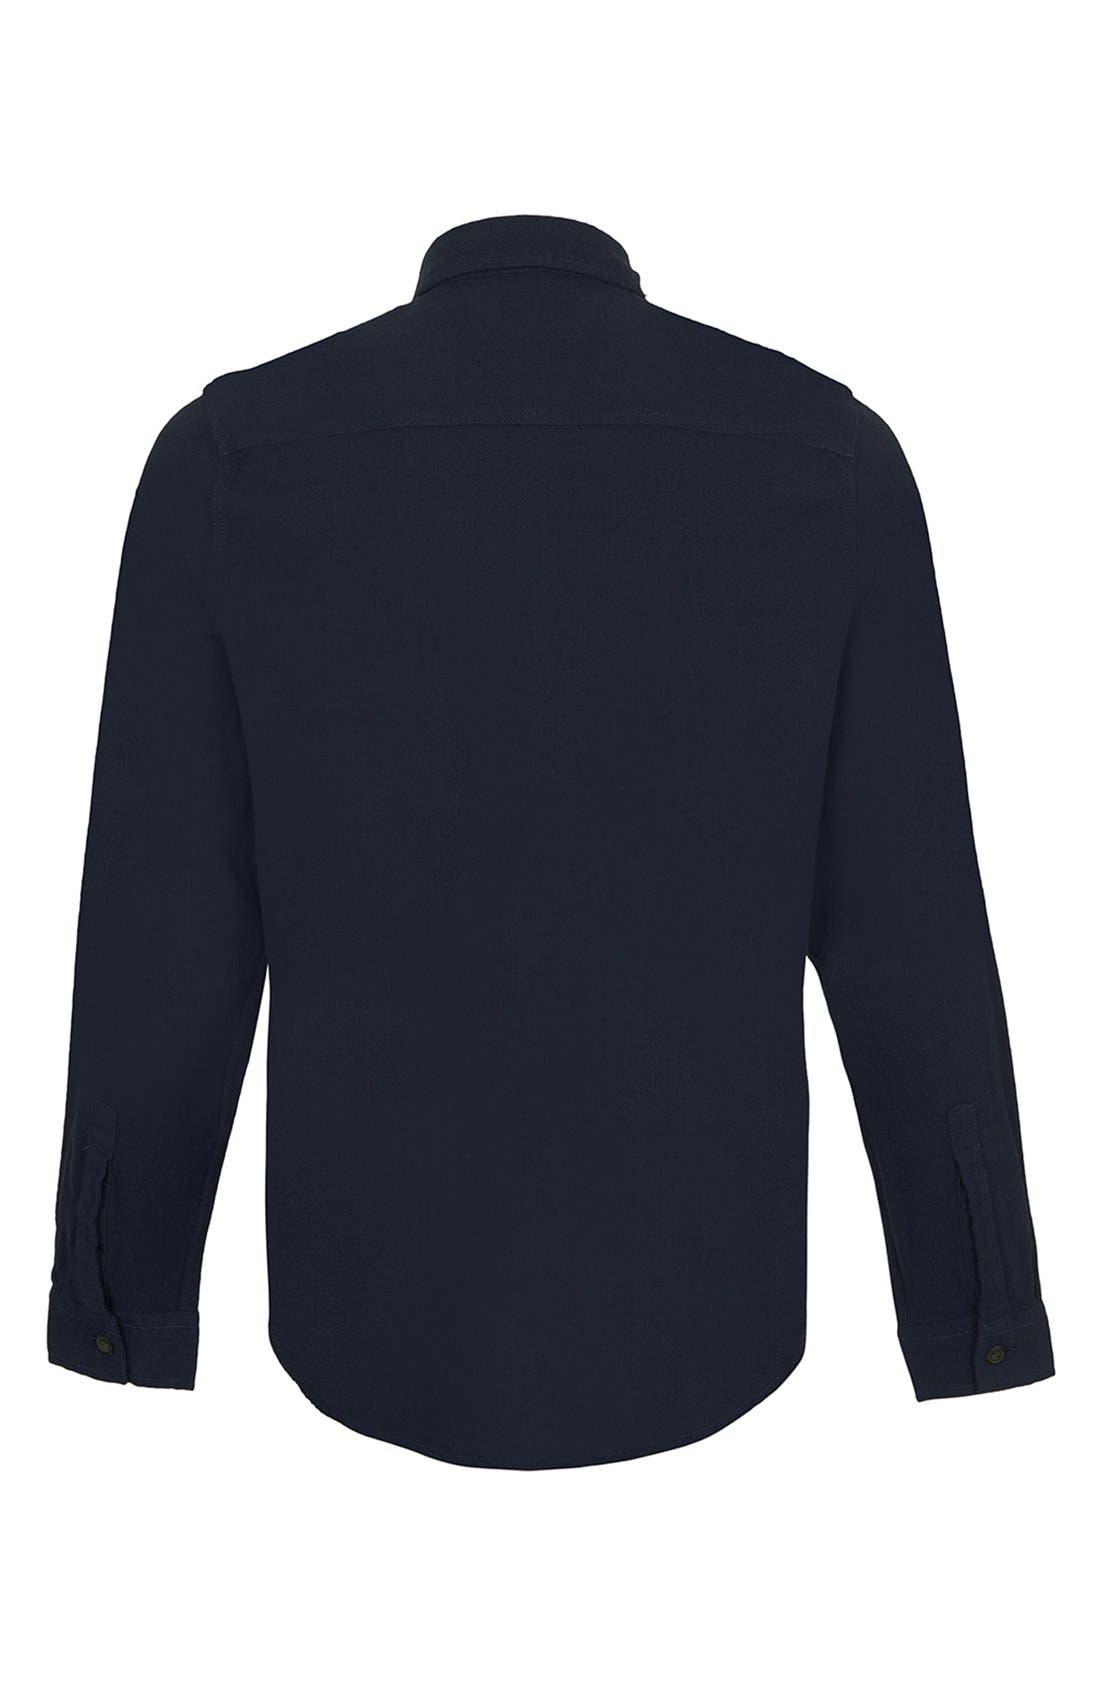 Alternate Image 2  - Topman Brushed Herringbone Shirt